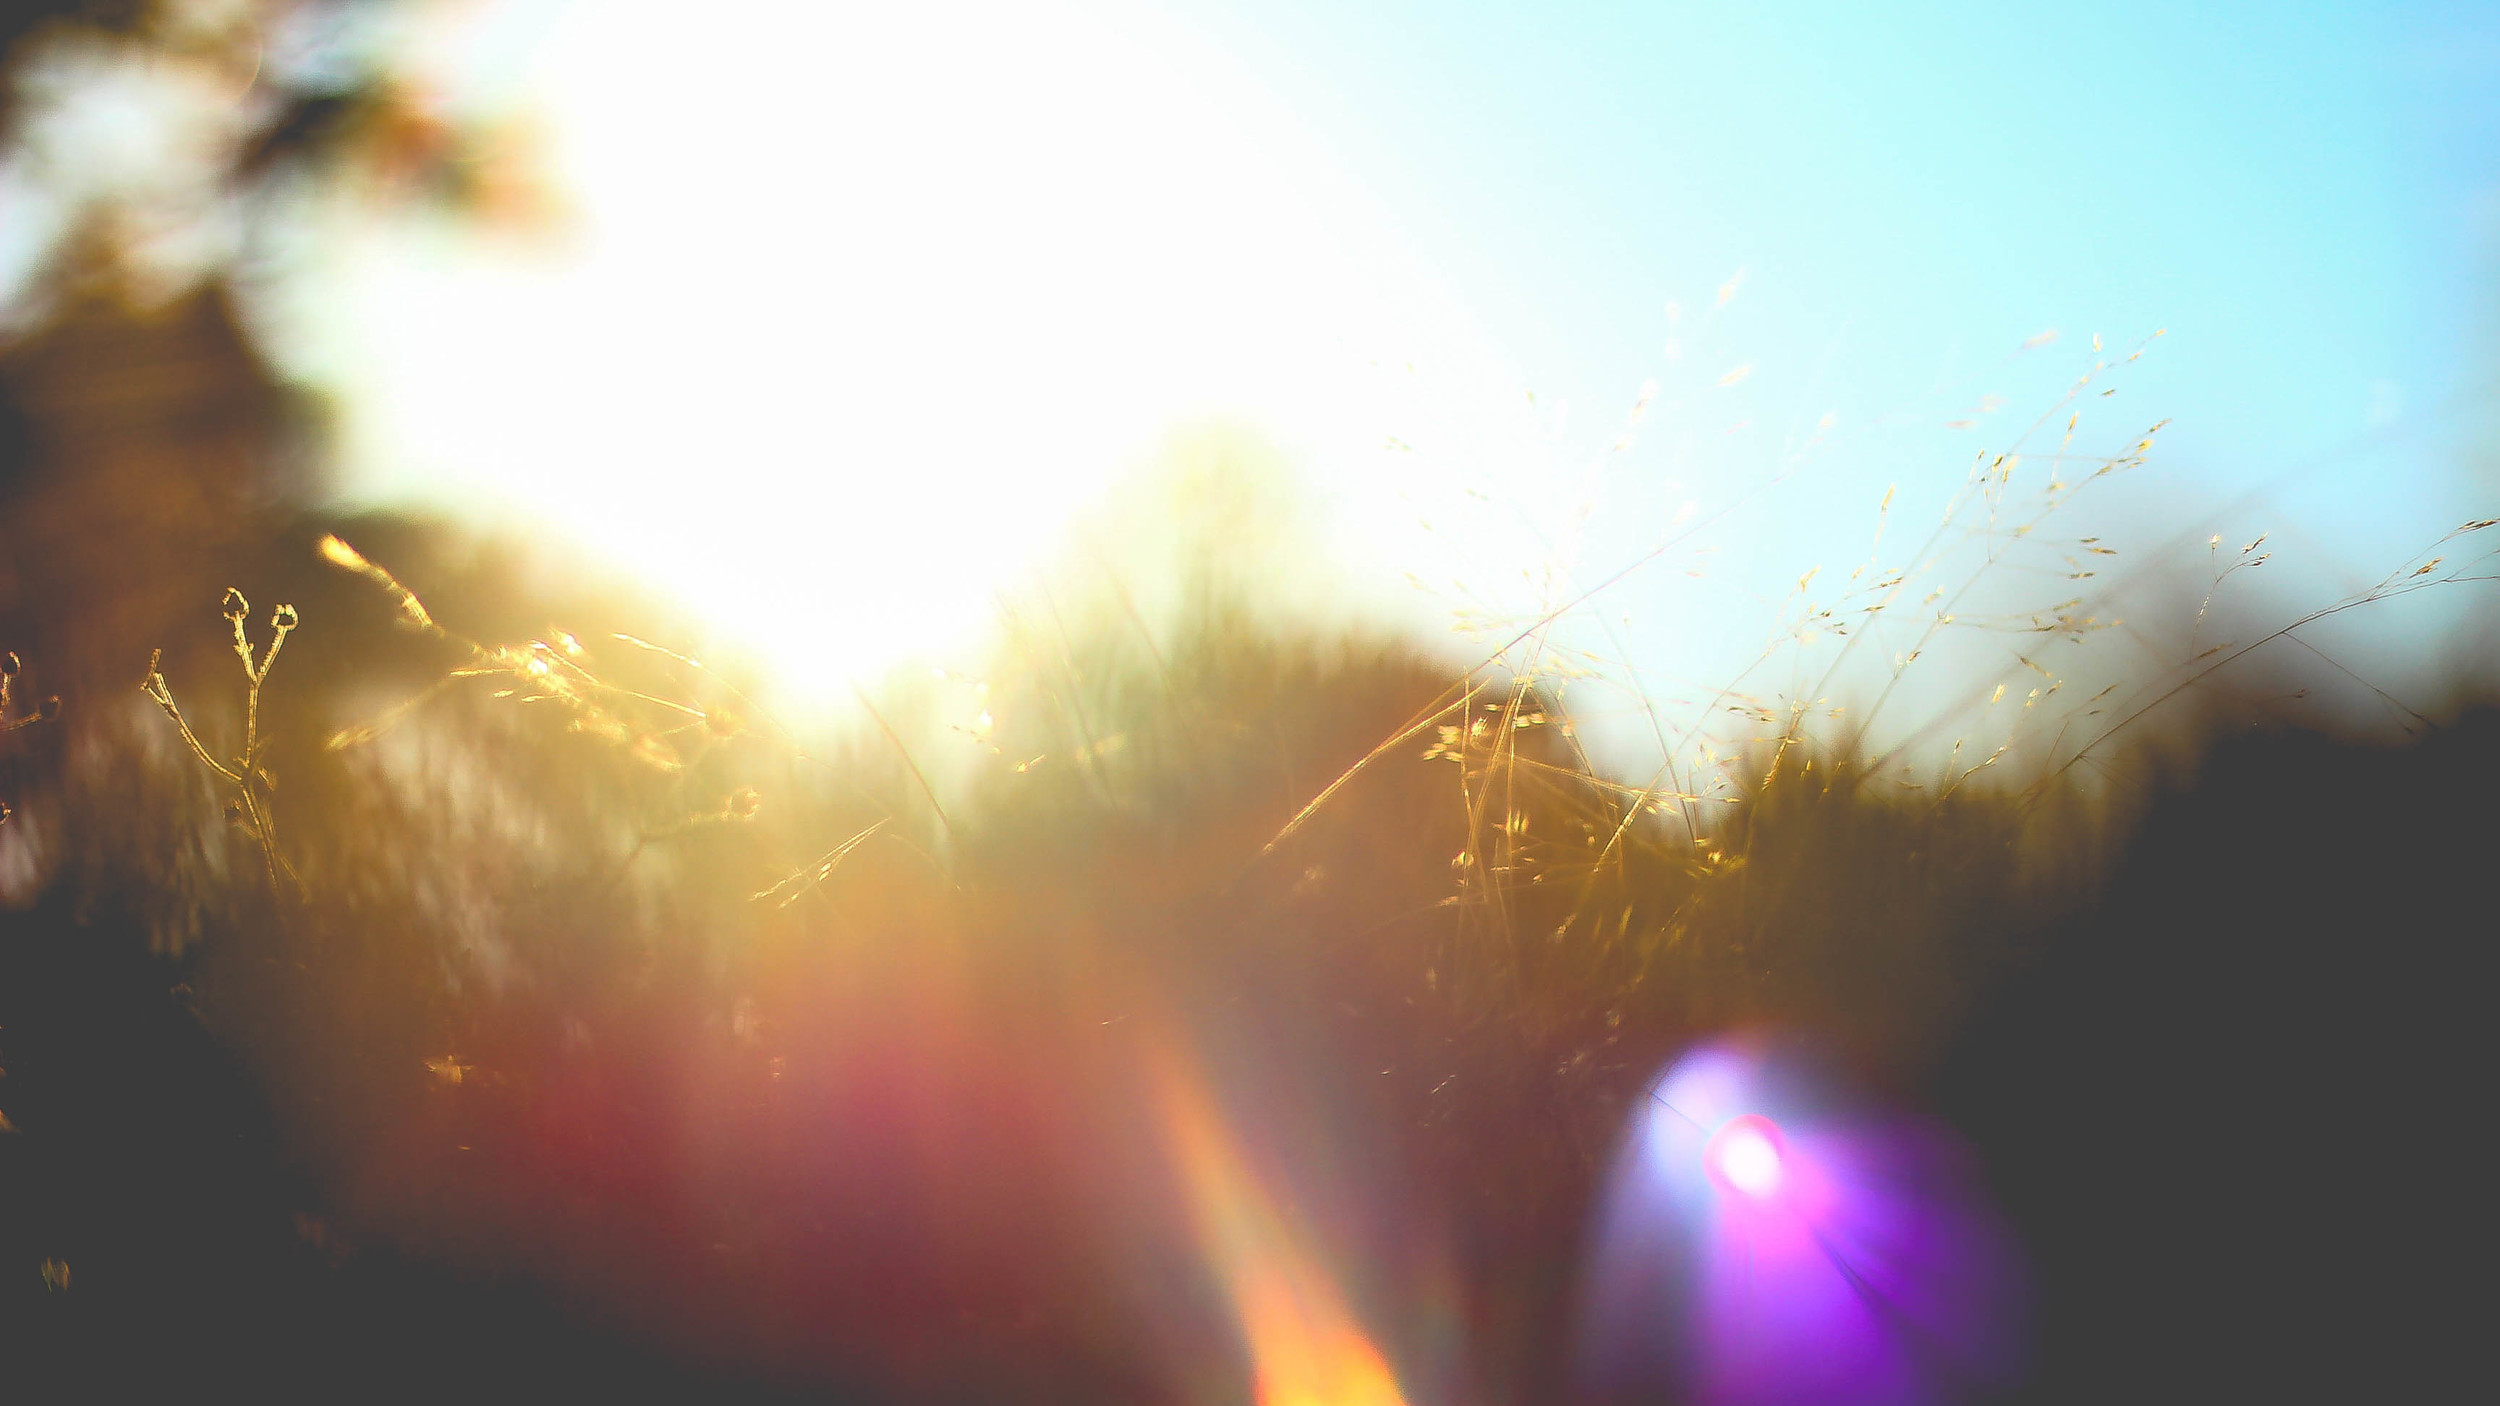 Nature itself-12.jpg